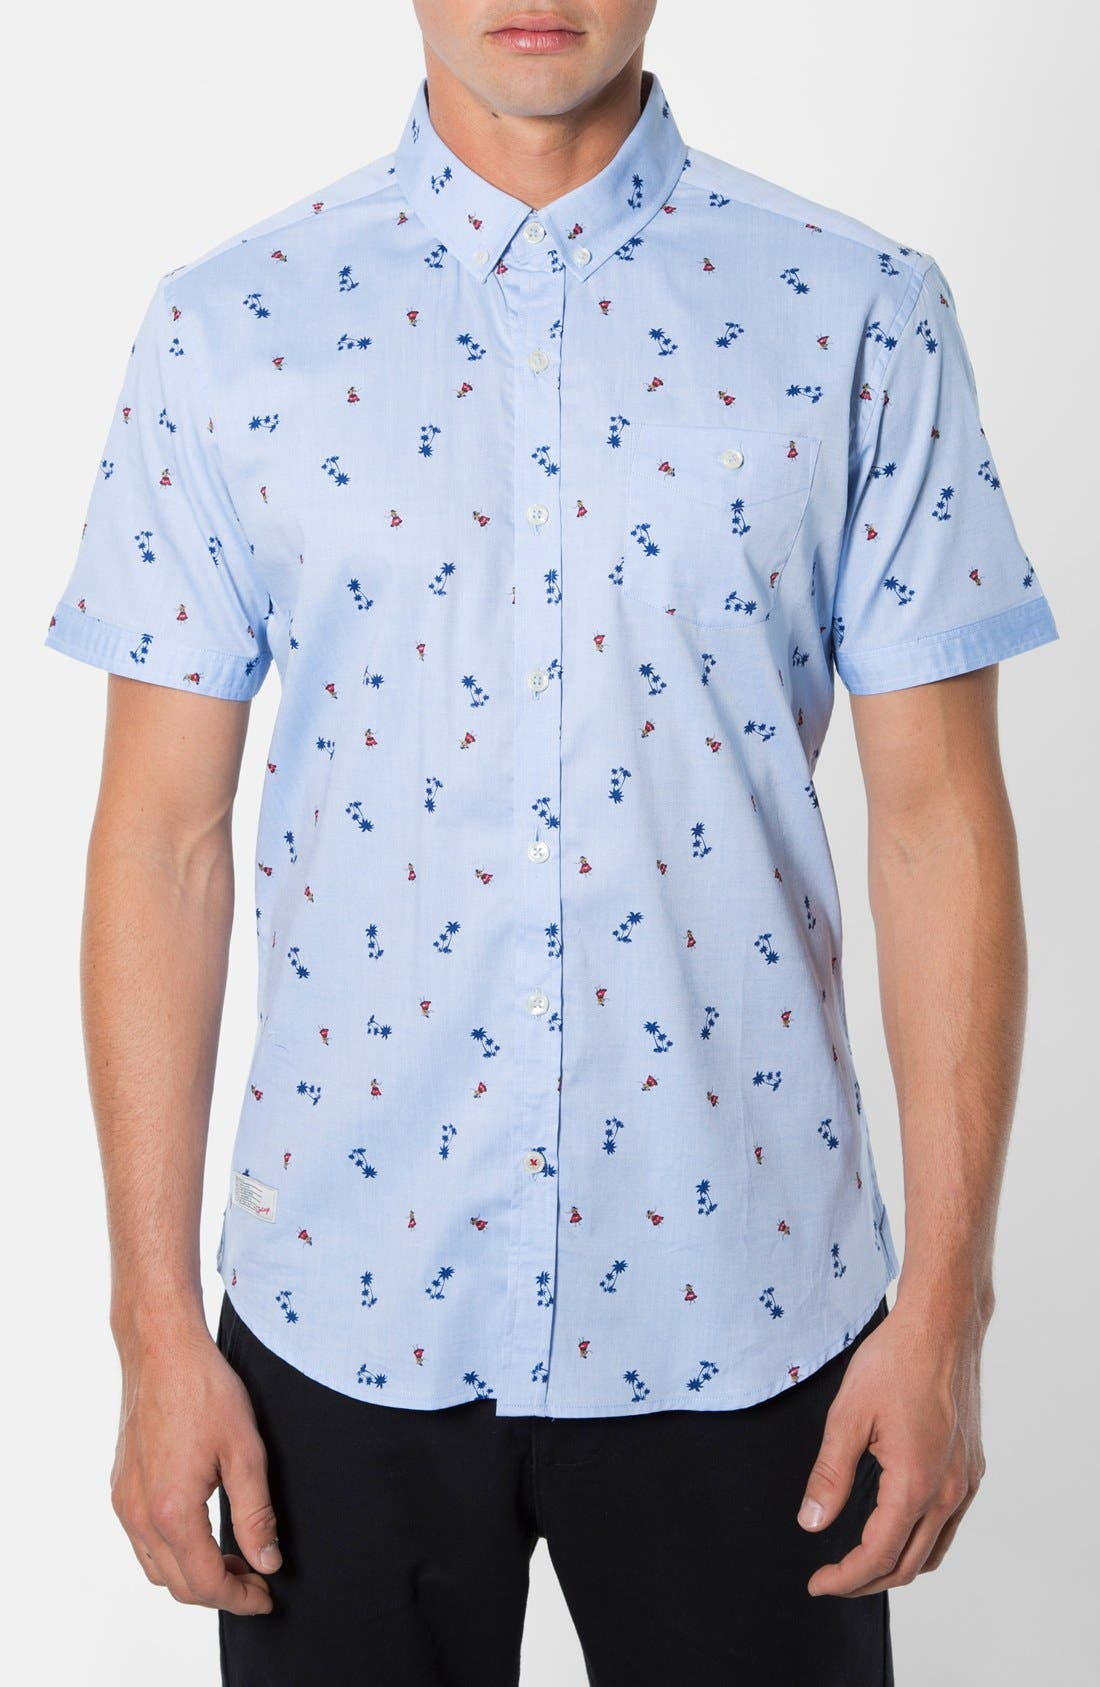 7 Diamonds 'California Sway' Trim Fit Short Sleeve Print Woven Shirt